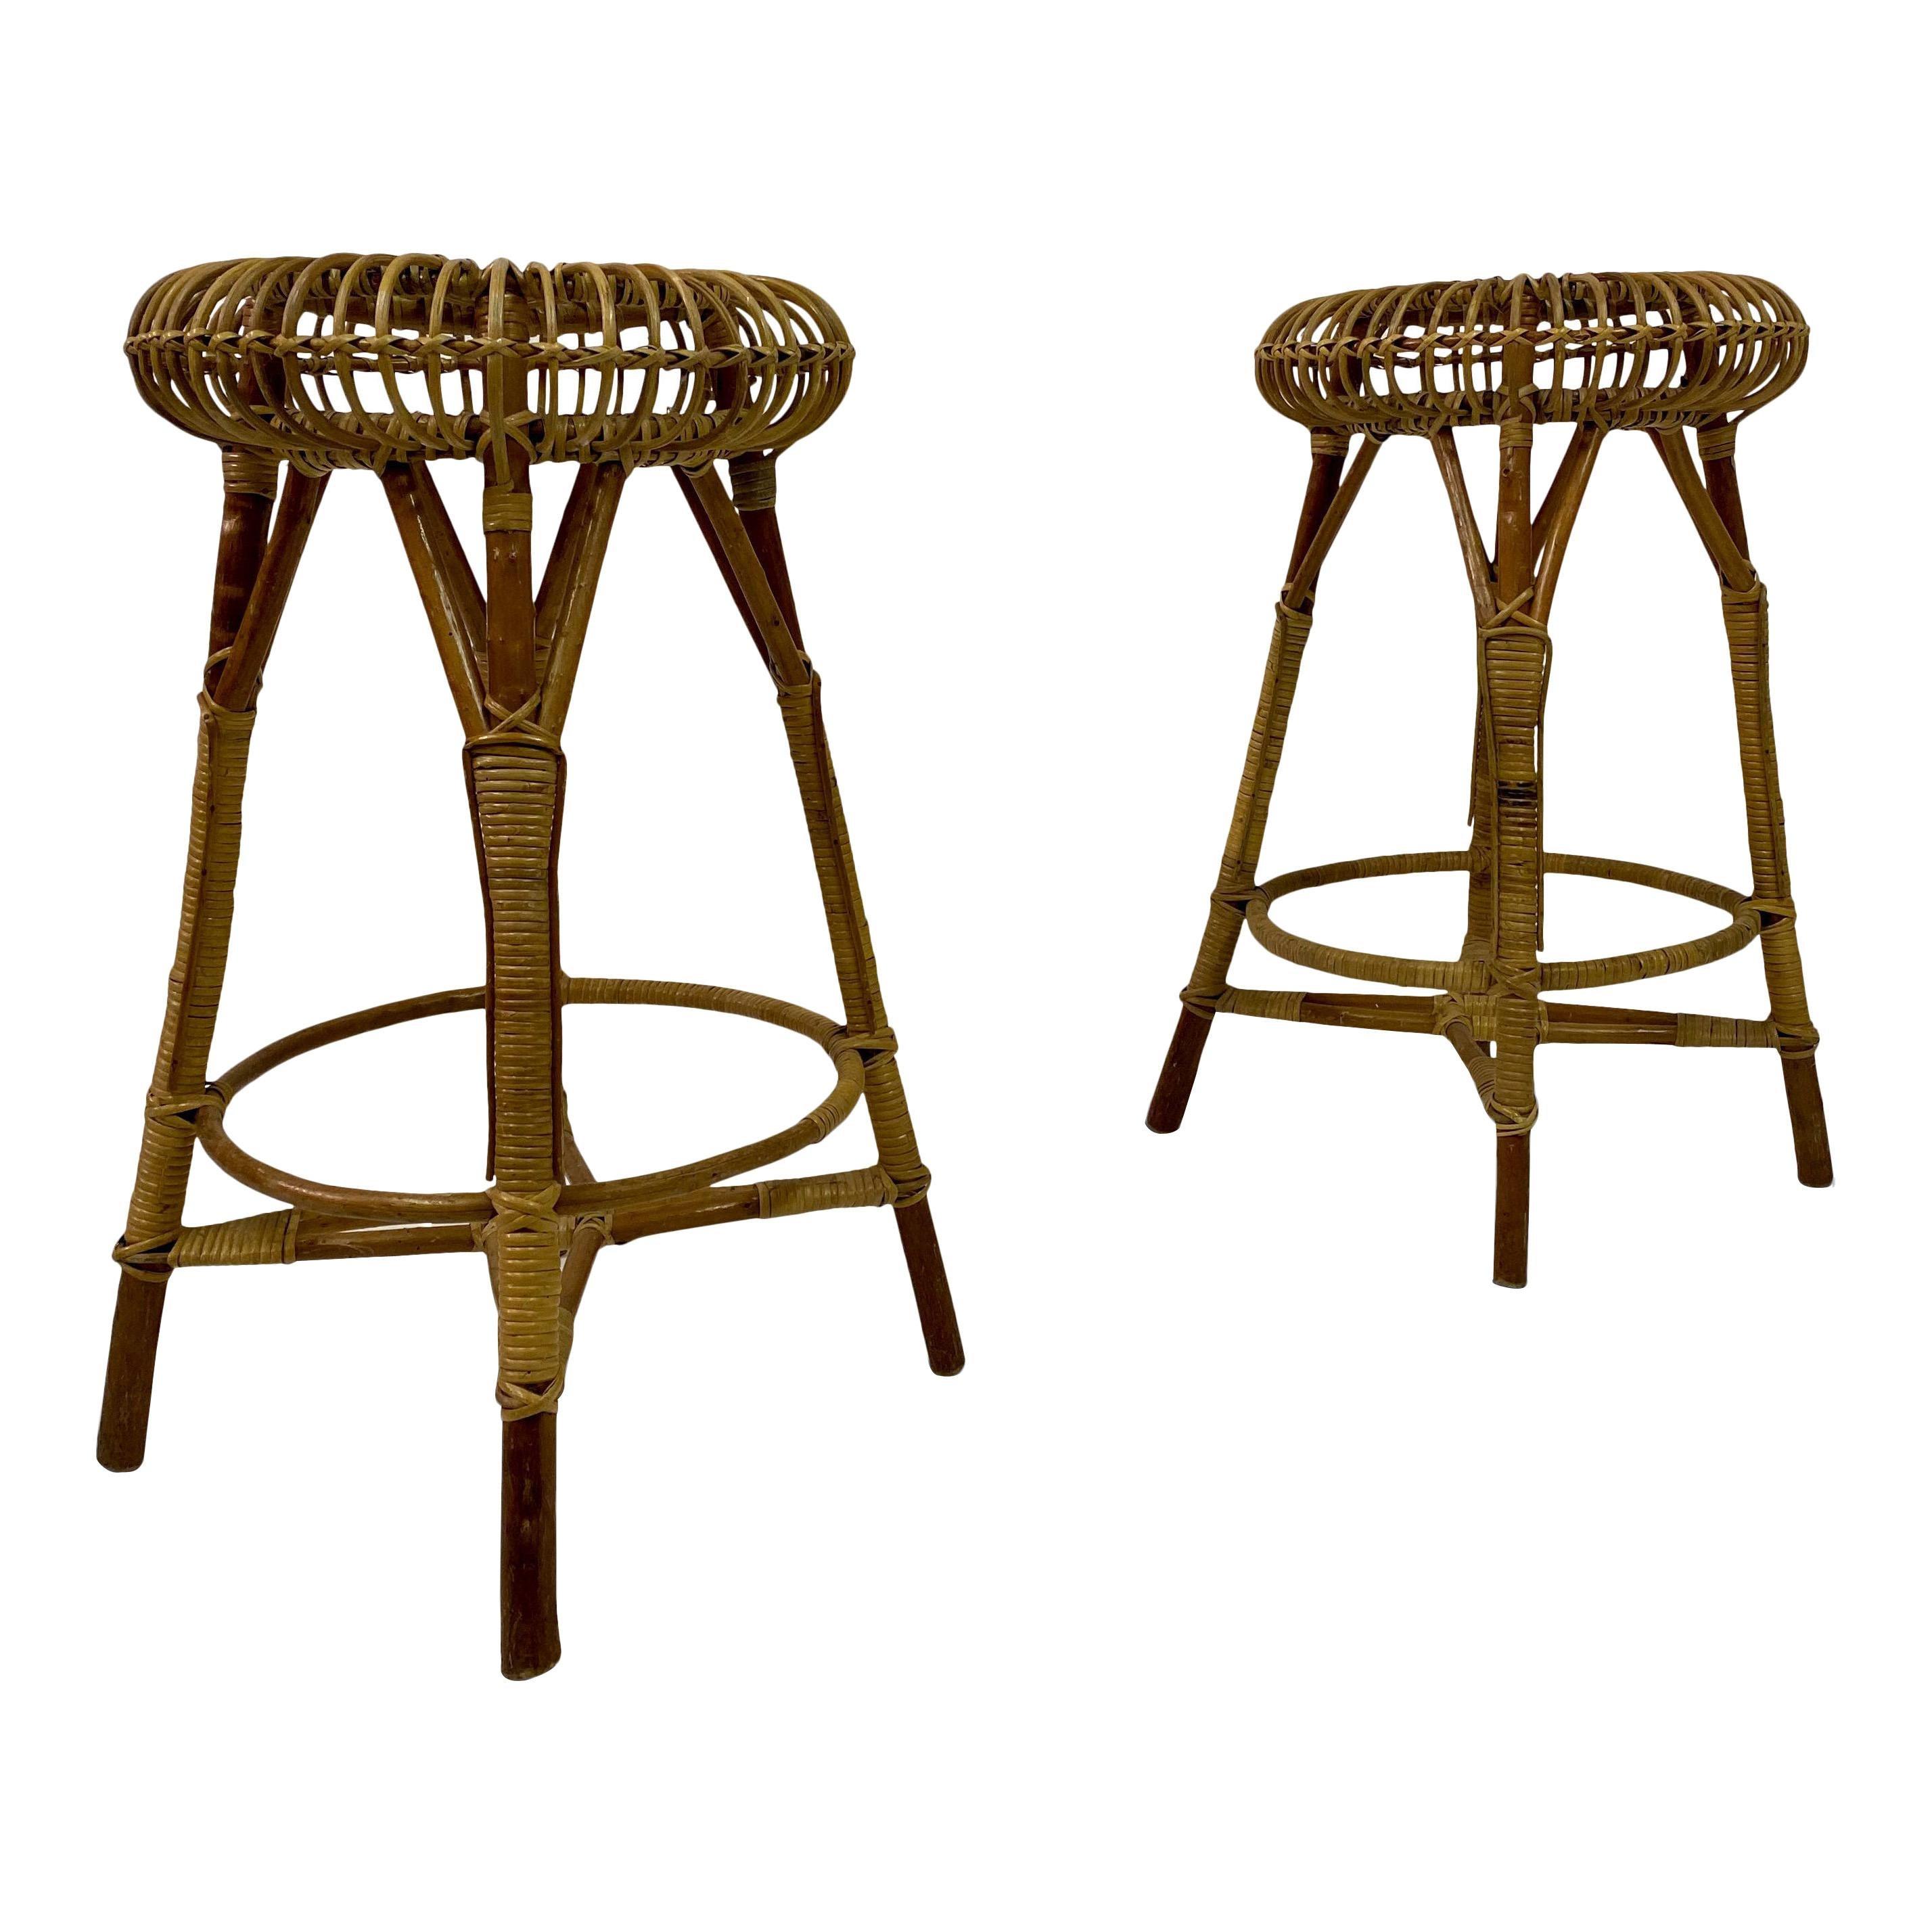 Pair of 1970s Italian Bamboo and Wicker Bars Stools